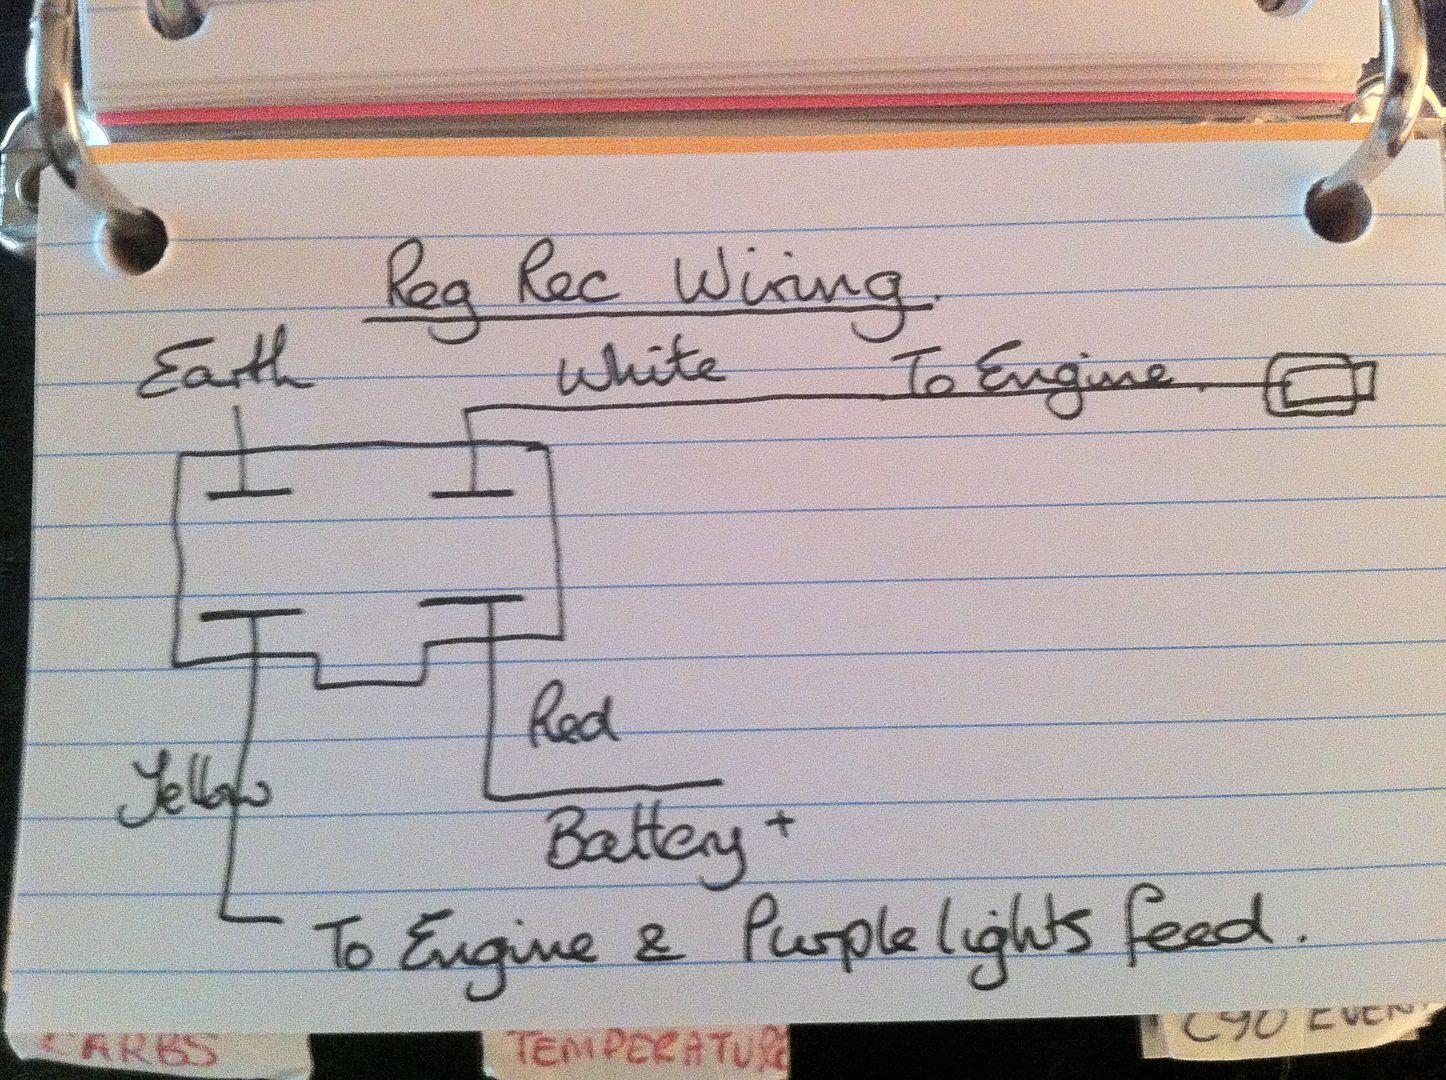 Dinli 90cc Wiring Diagram | Wiring Diagram on kia wiring diagram, nissan wiring diagram, norton wiring diagram, dodge wiring diagram, chevrolet wiring diagram, garelli wiring diagram, toyota wiring diagram, kazuma wiring diagram, husaberg wiring diagram, hunter wiring diagram, beta wiring diagram, bajaj wiring diagram, smc wiring diagram, mitsubishi wiring diagram, kawasaki wiring diagram, atv wiring diagram, generic wiring diagram, jeep wiring diagram, motorcycle wiring diagram, honda wiring diagram,